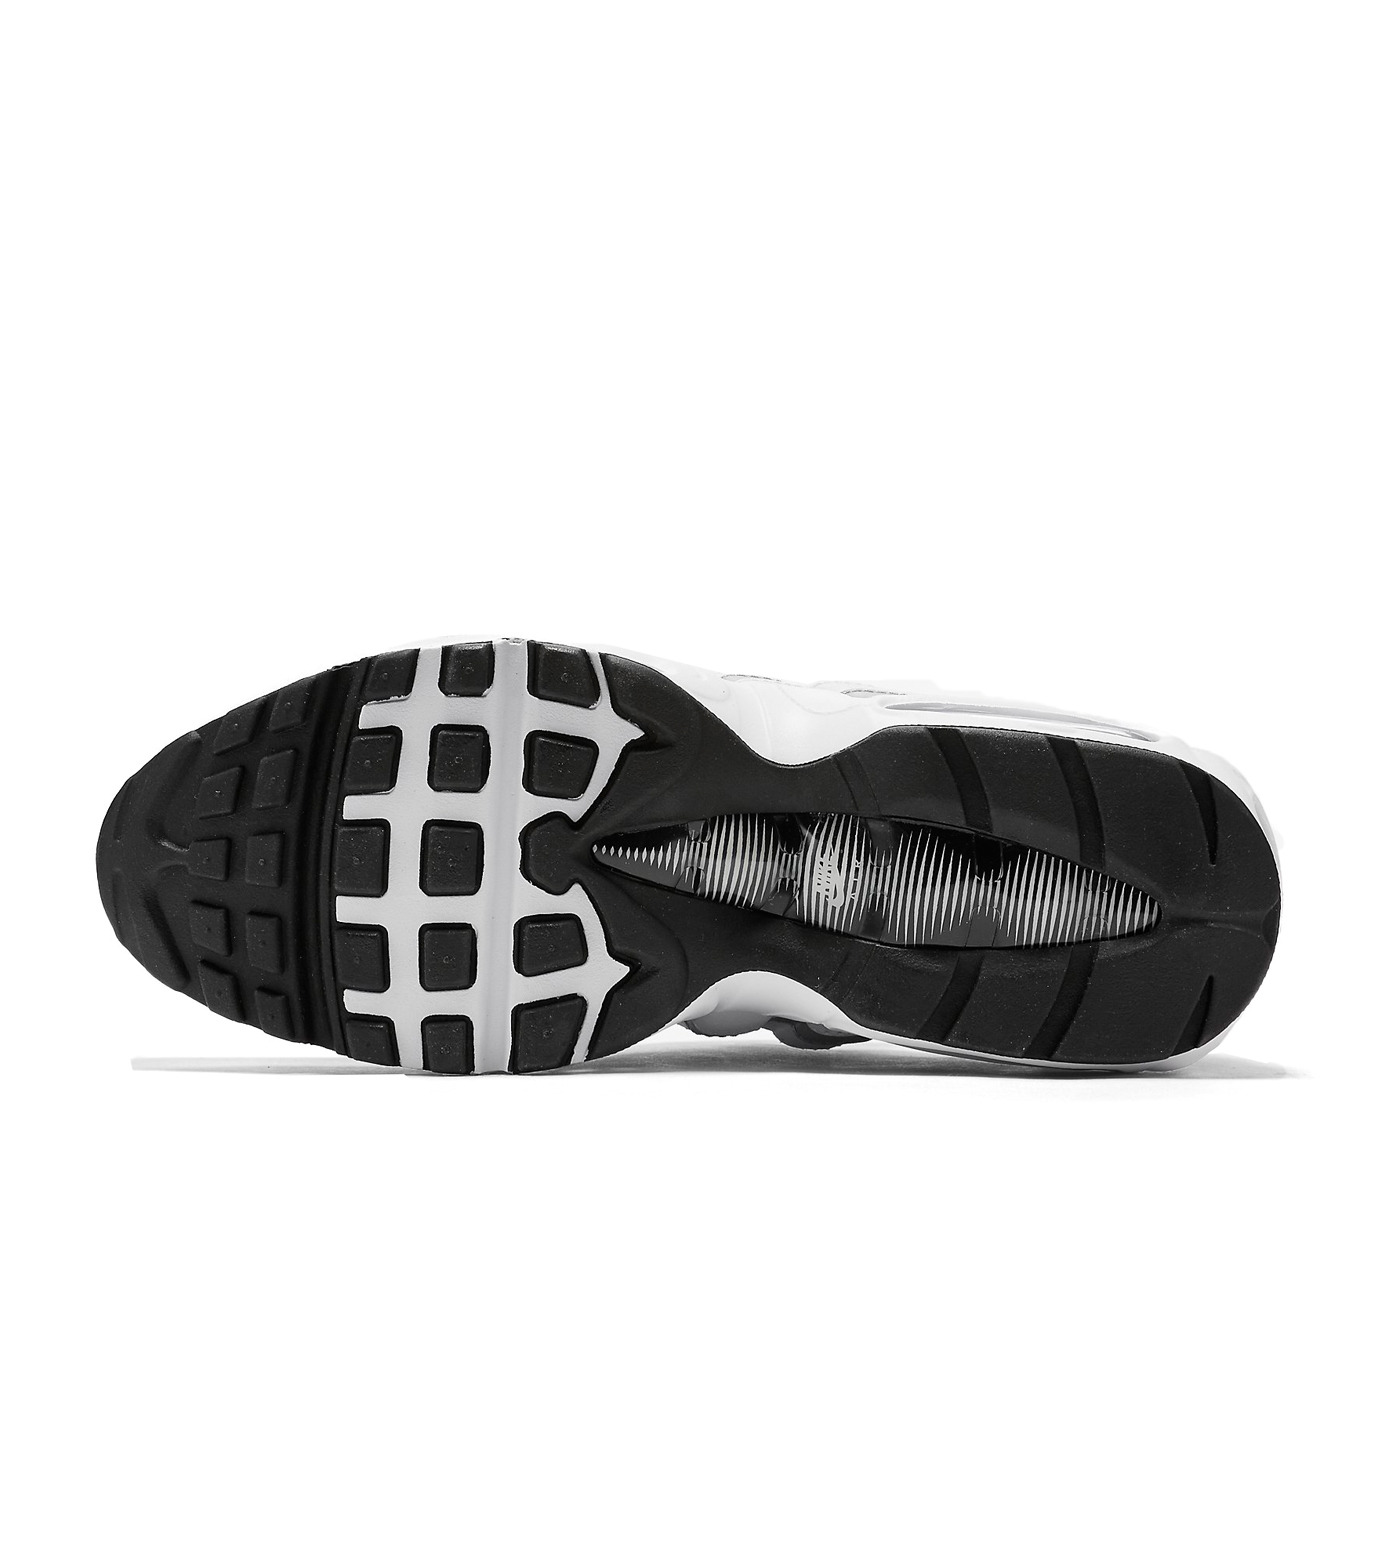 NIKE(ナイキ)のAIR MAX 95 ESSENTIAL-WHITE(シューズ/shoes)-749766-104-4 拡大詳細画像2